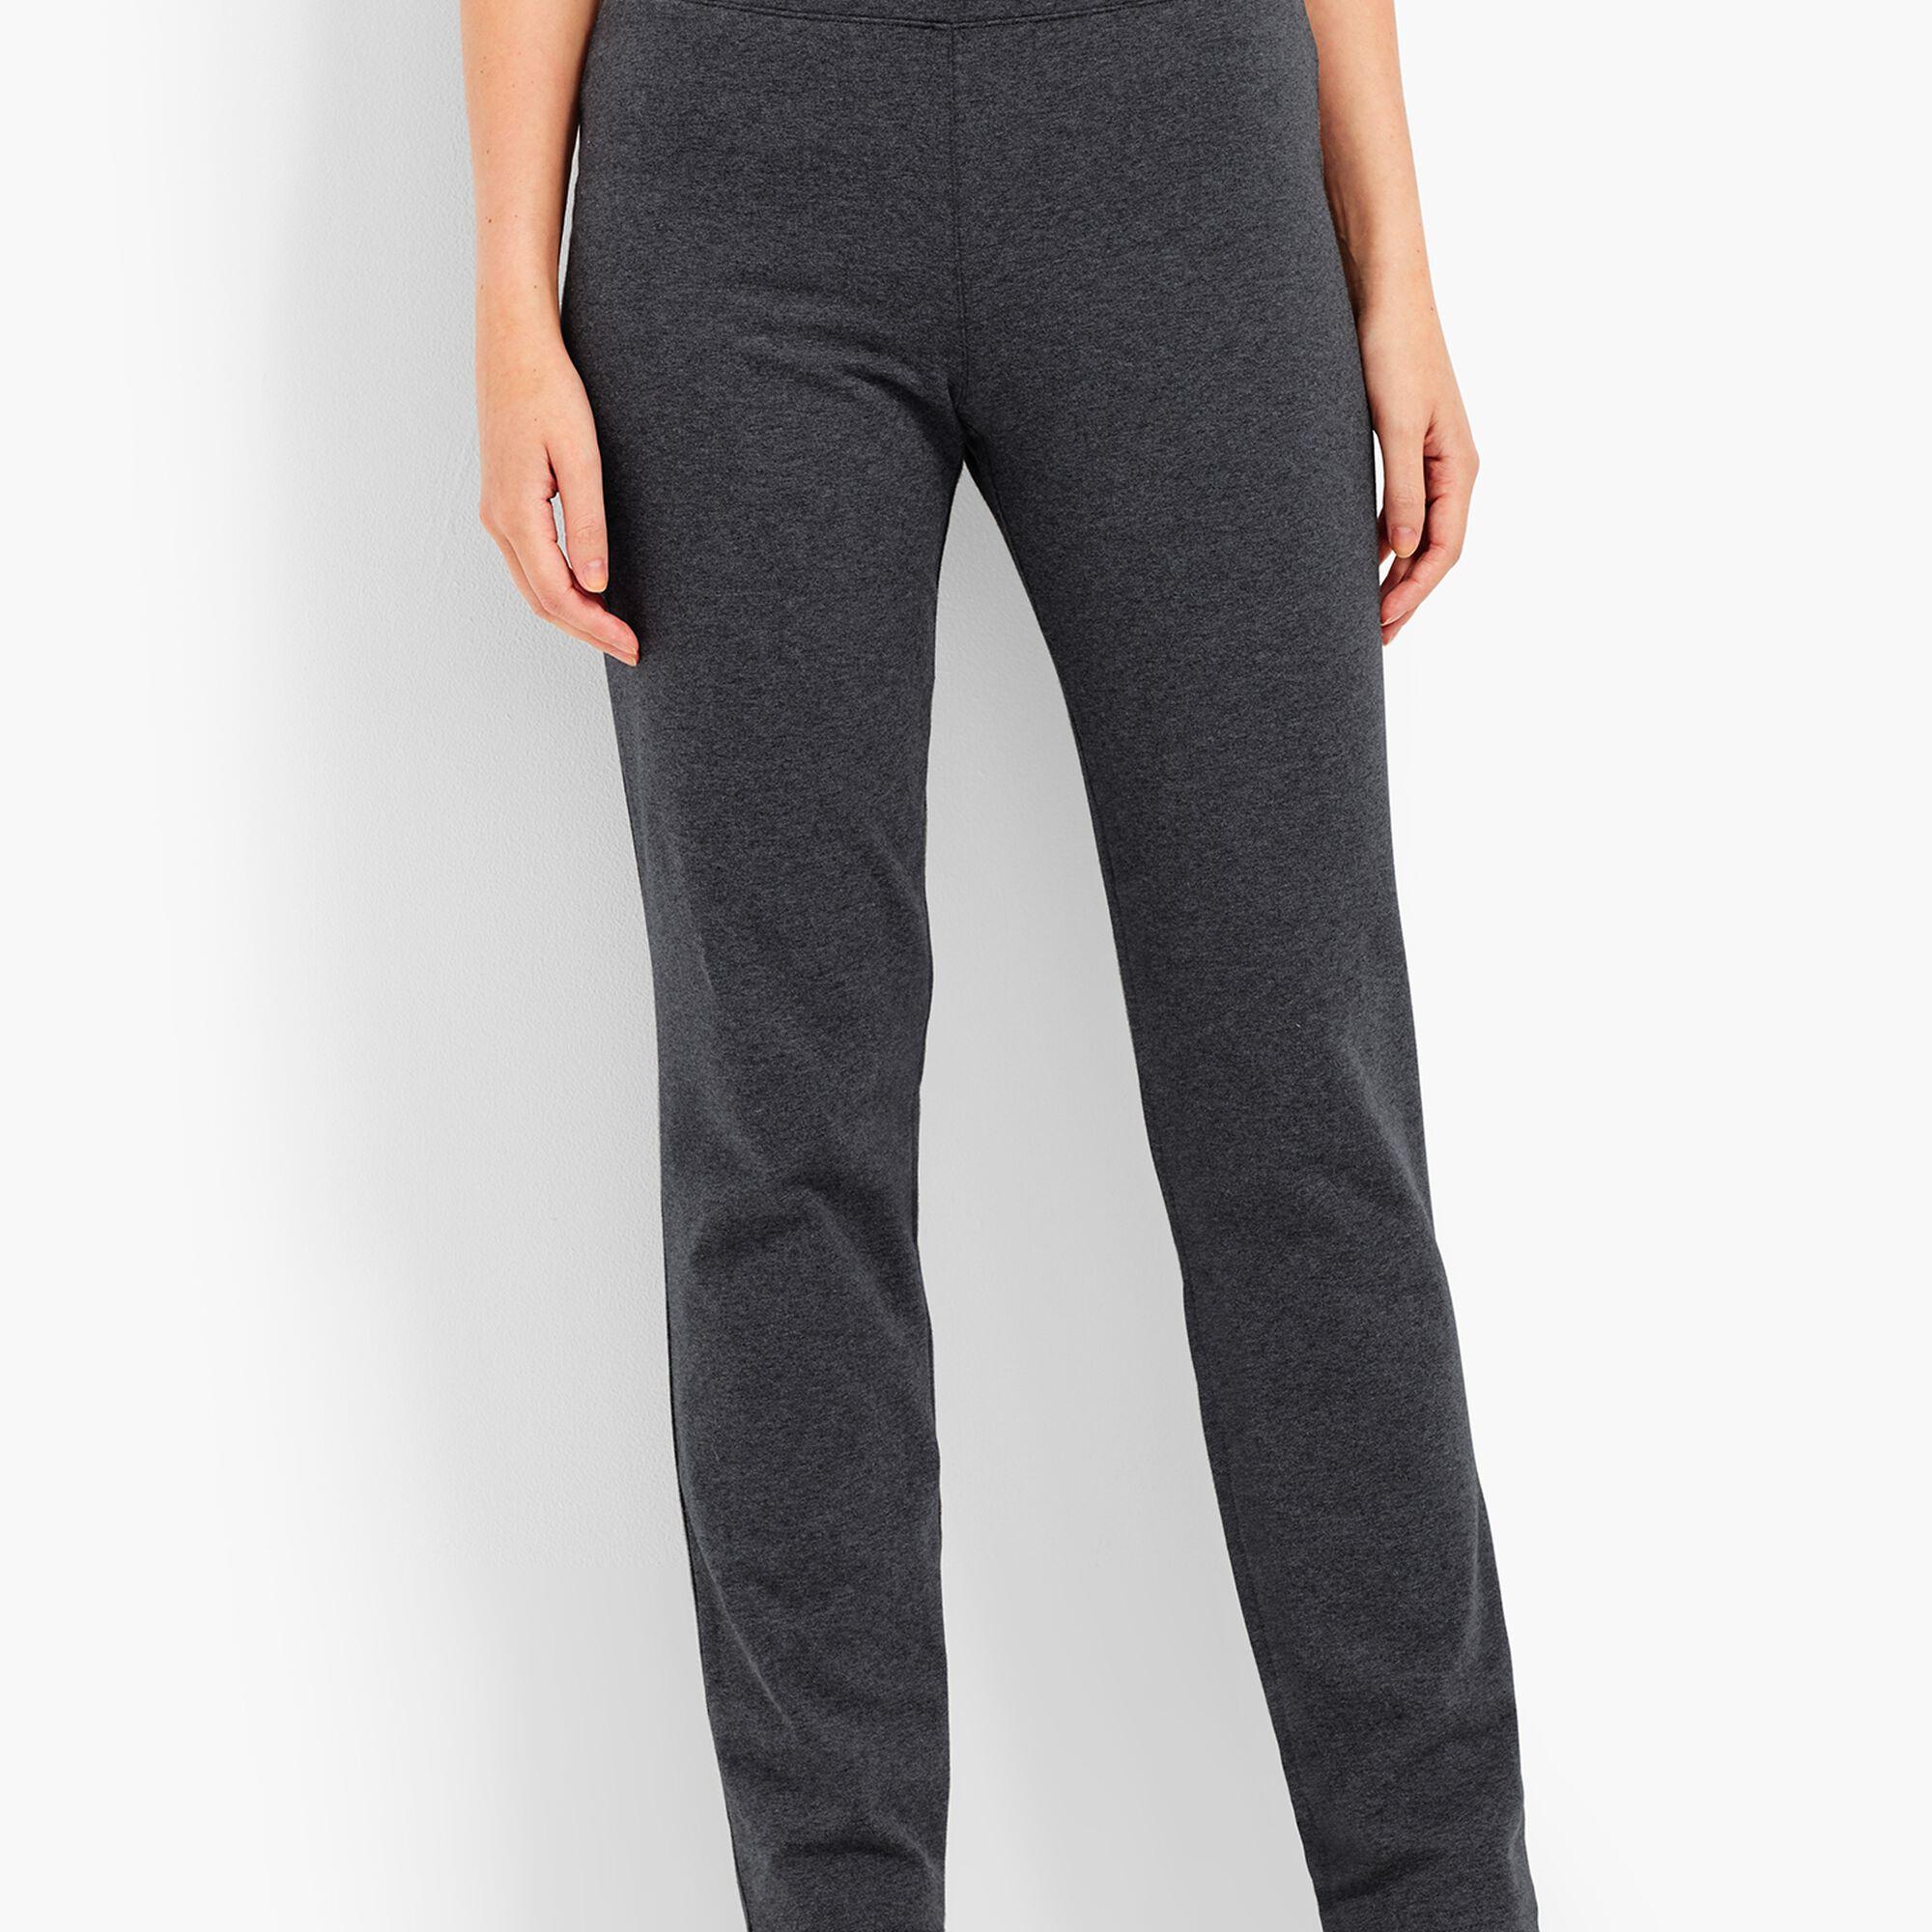 420f24dc53 Everyday Full-Length Straight-Leg Yoga Pant   Talbots